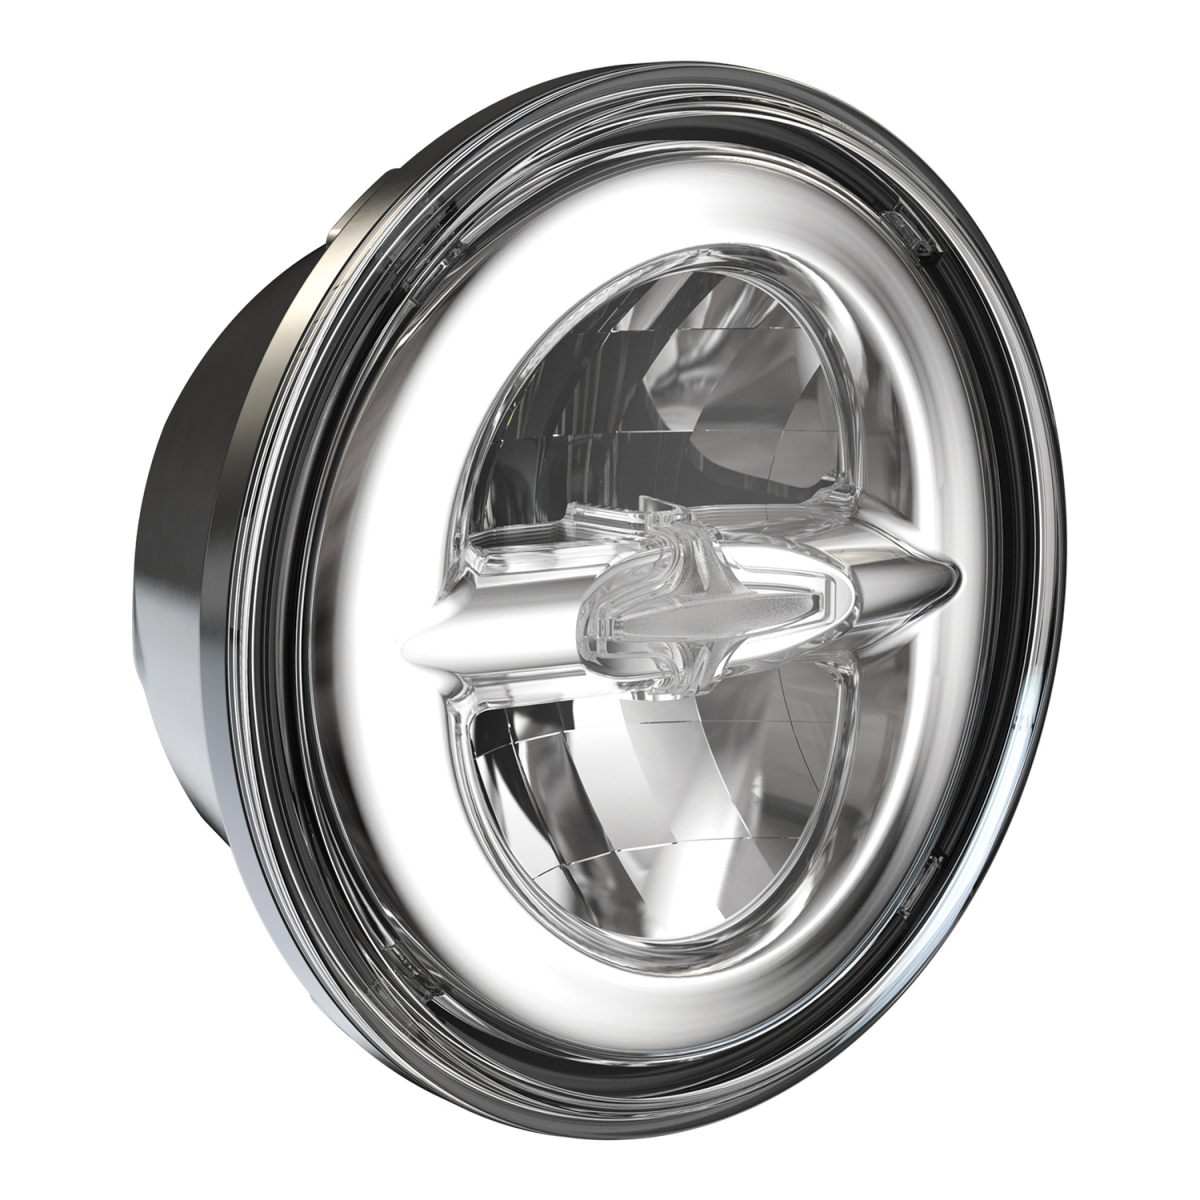 Reflector LED Headlights – Model 8620